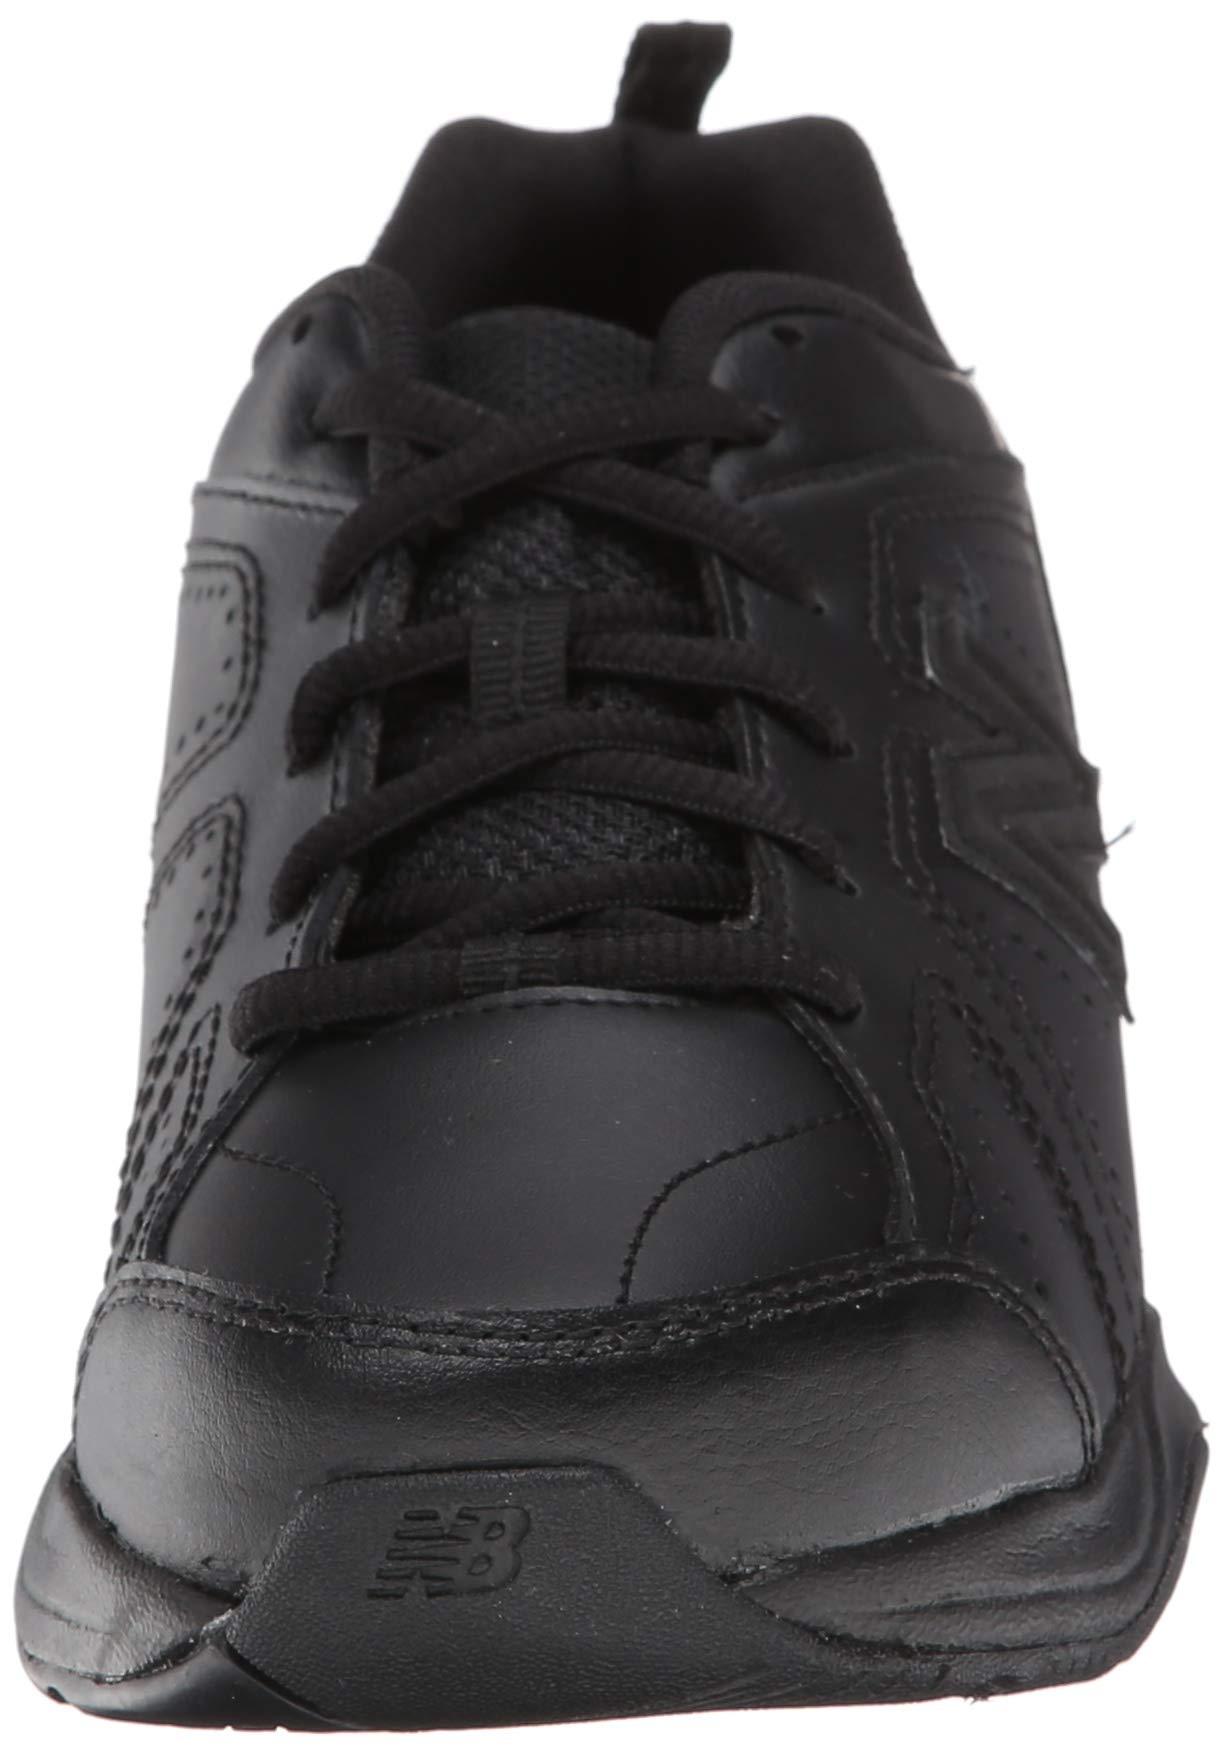 New Balance Boys KX624 Lace-Up Training Shoe ,Black,7 W US Big Kid by New Balance (Image #4)